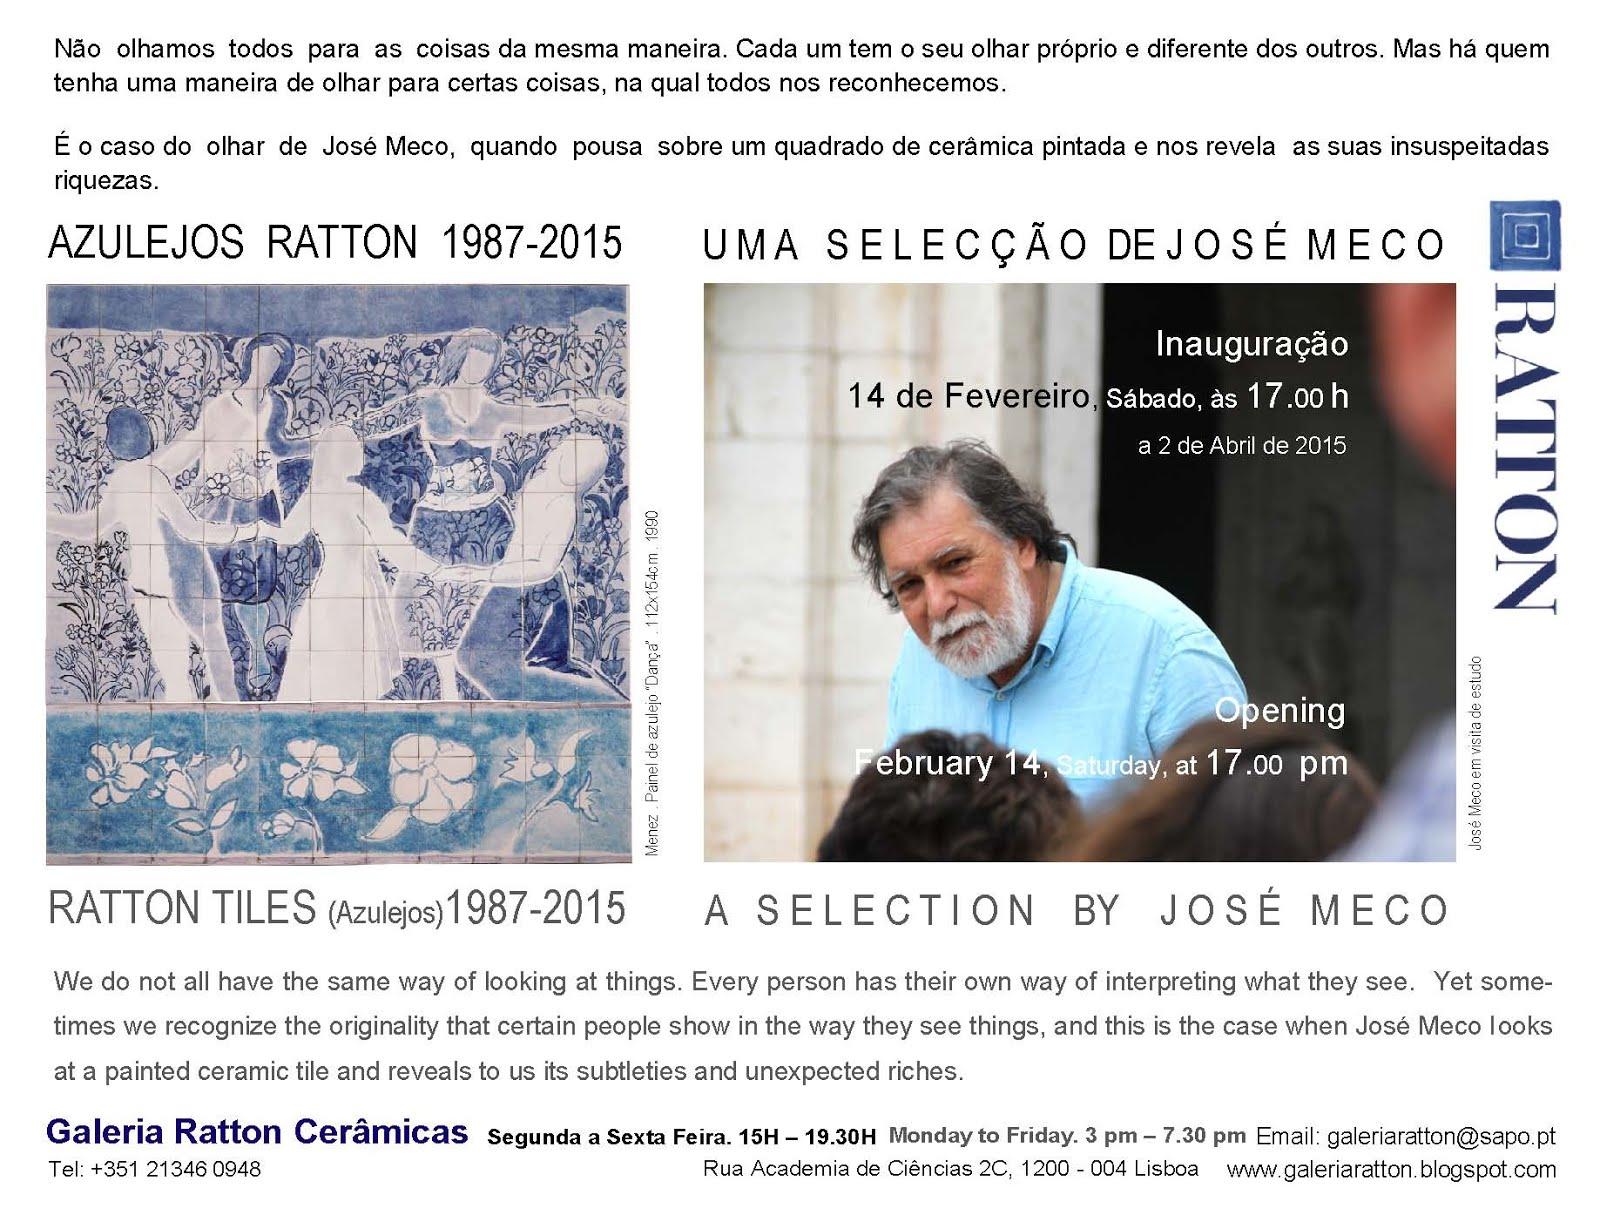 Azulejos Ratton . José Meco